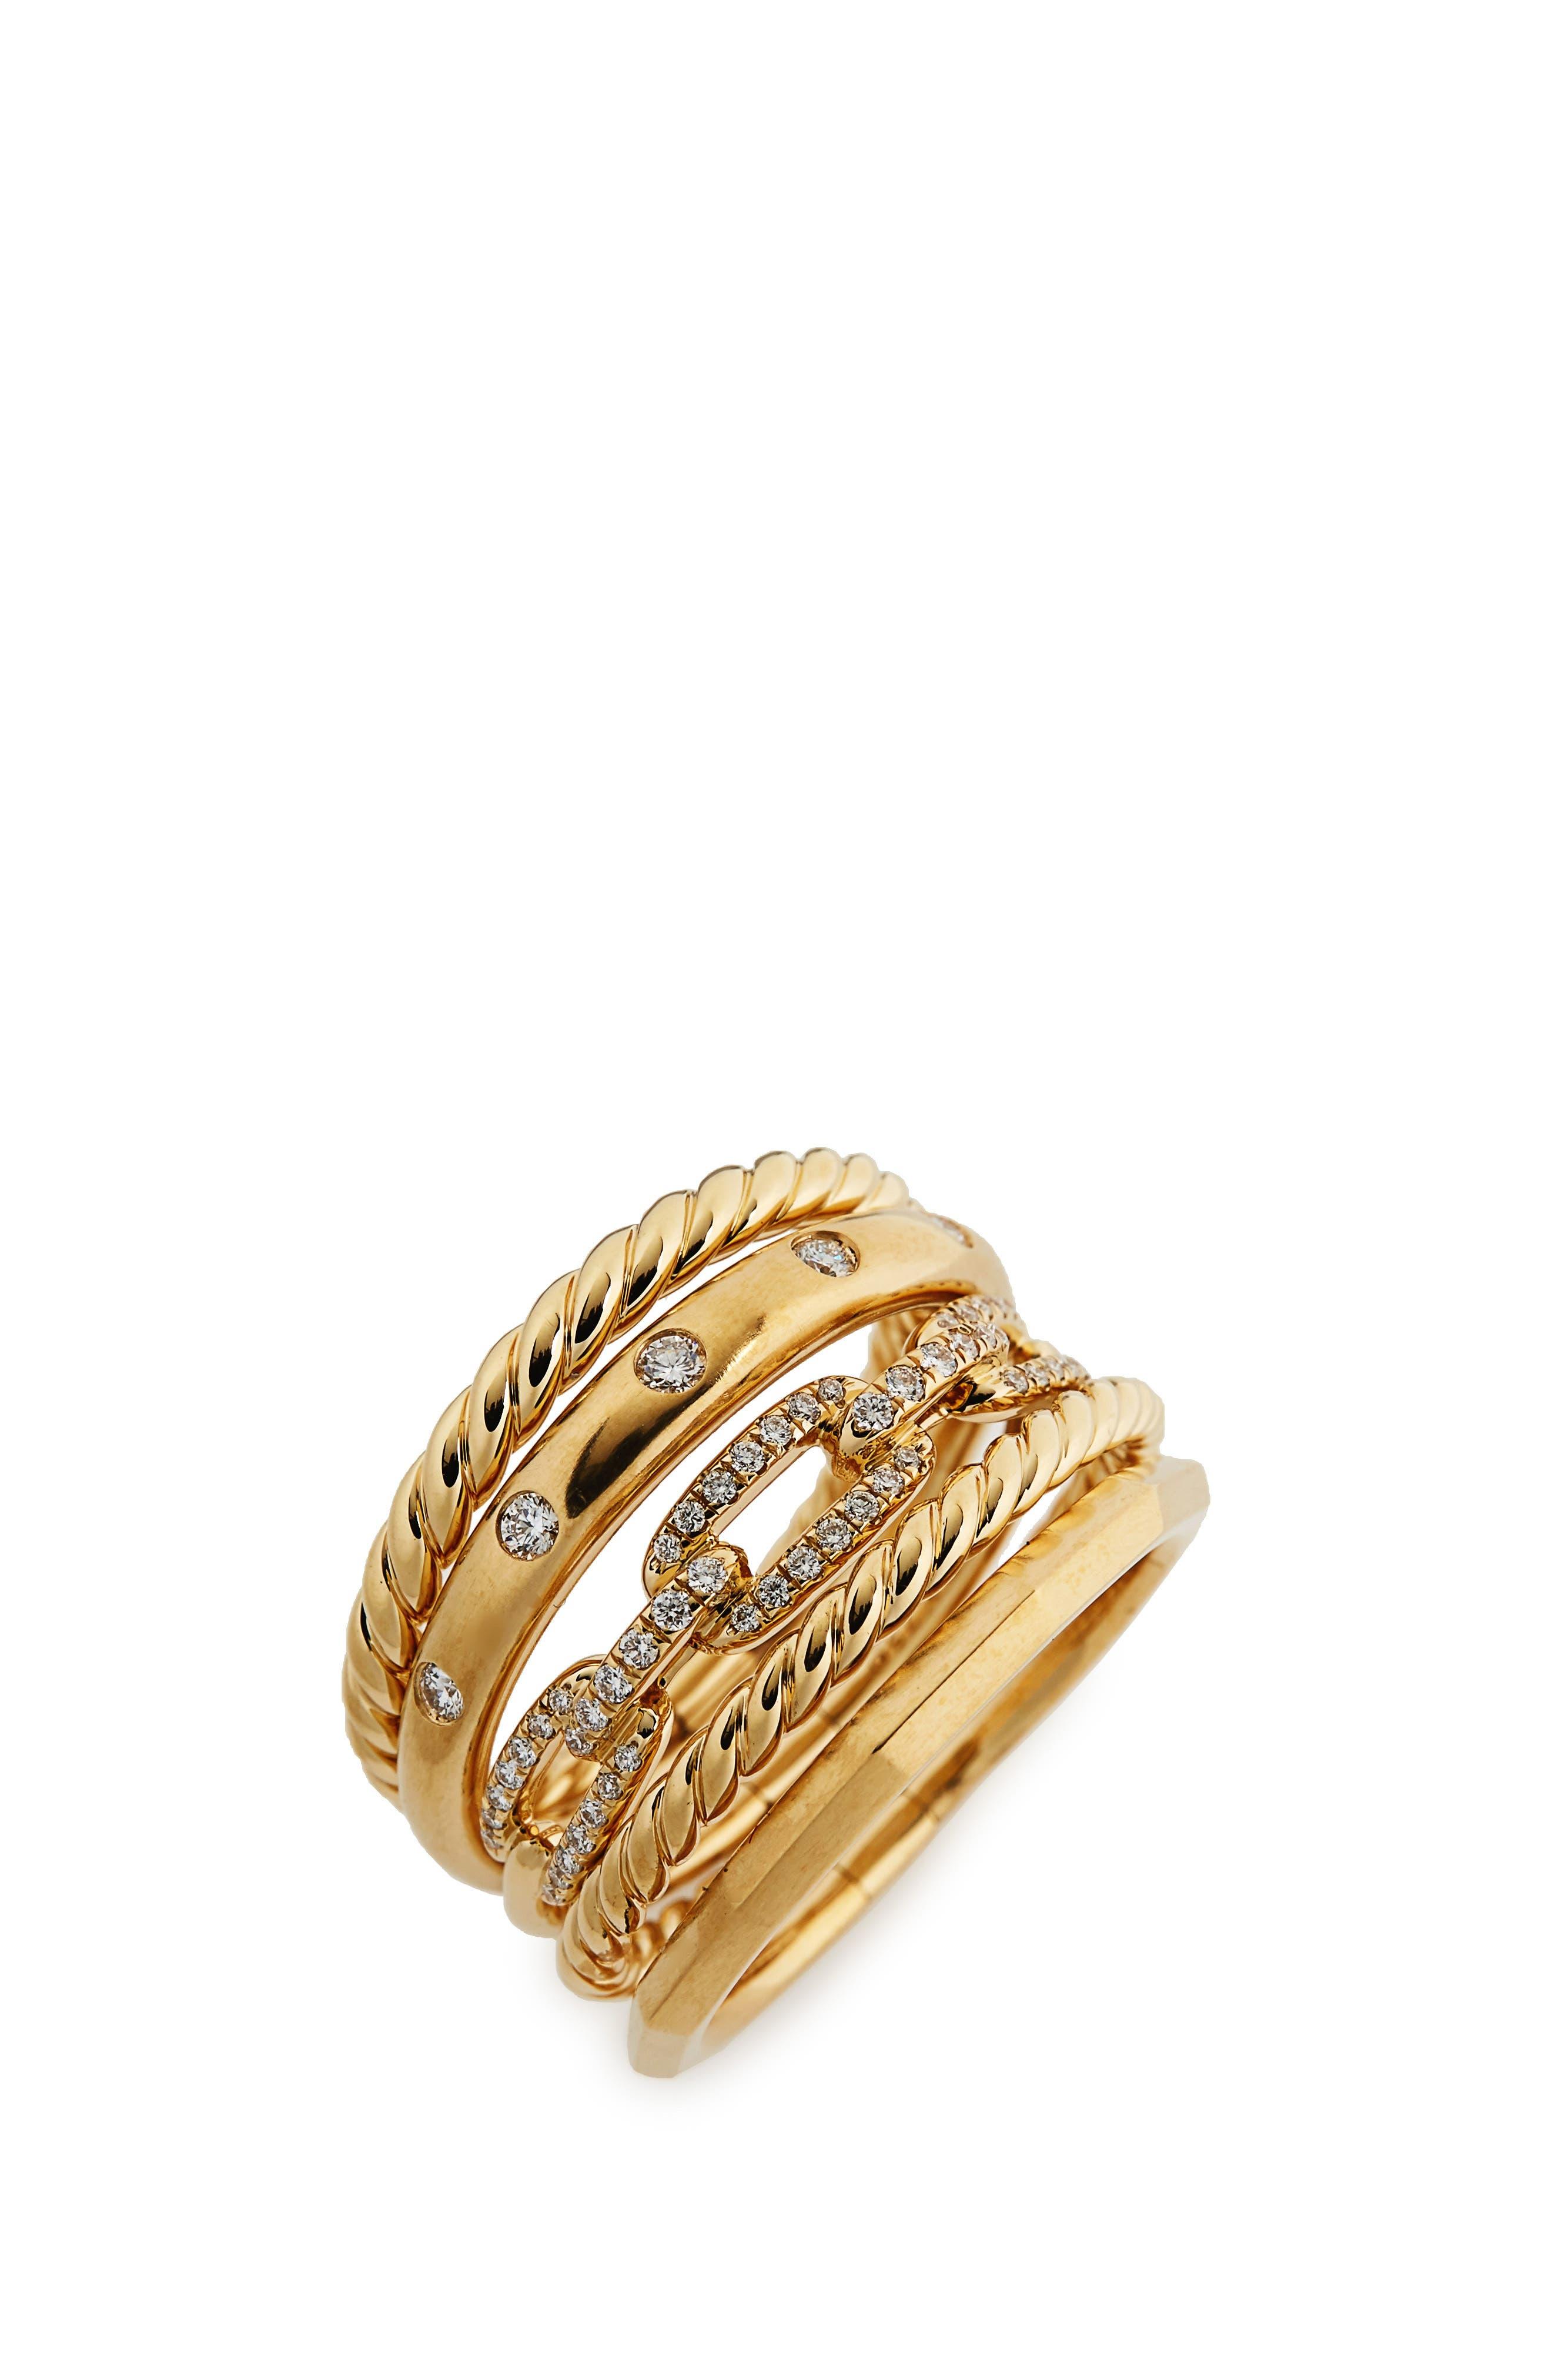 David Yurman Stax Wide Ring with Diamonds in 18K Gold, 15mm